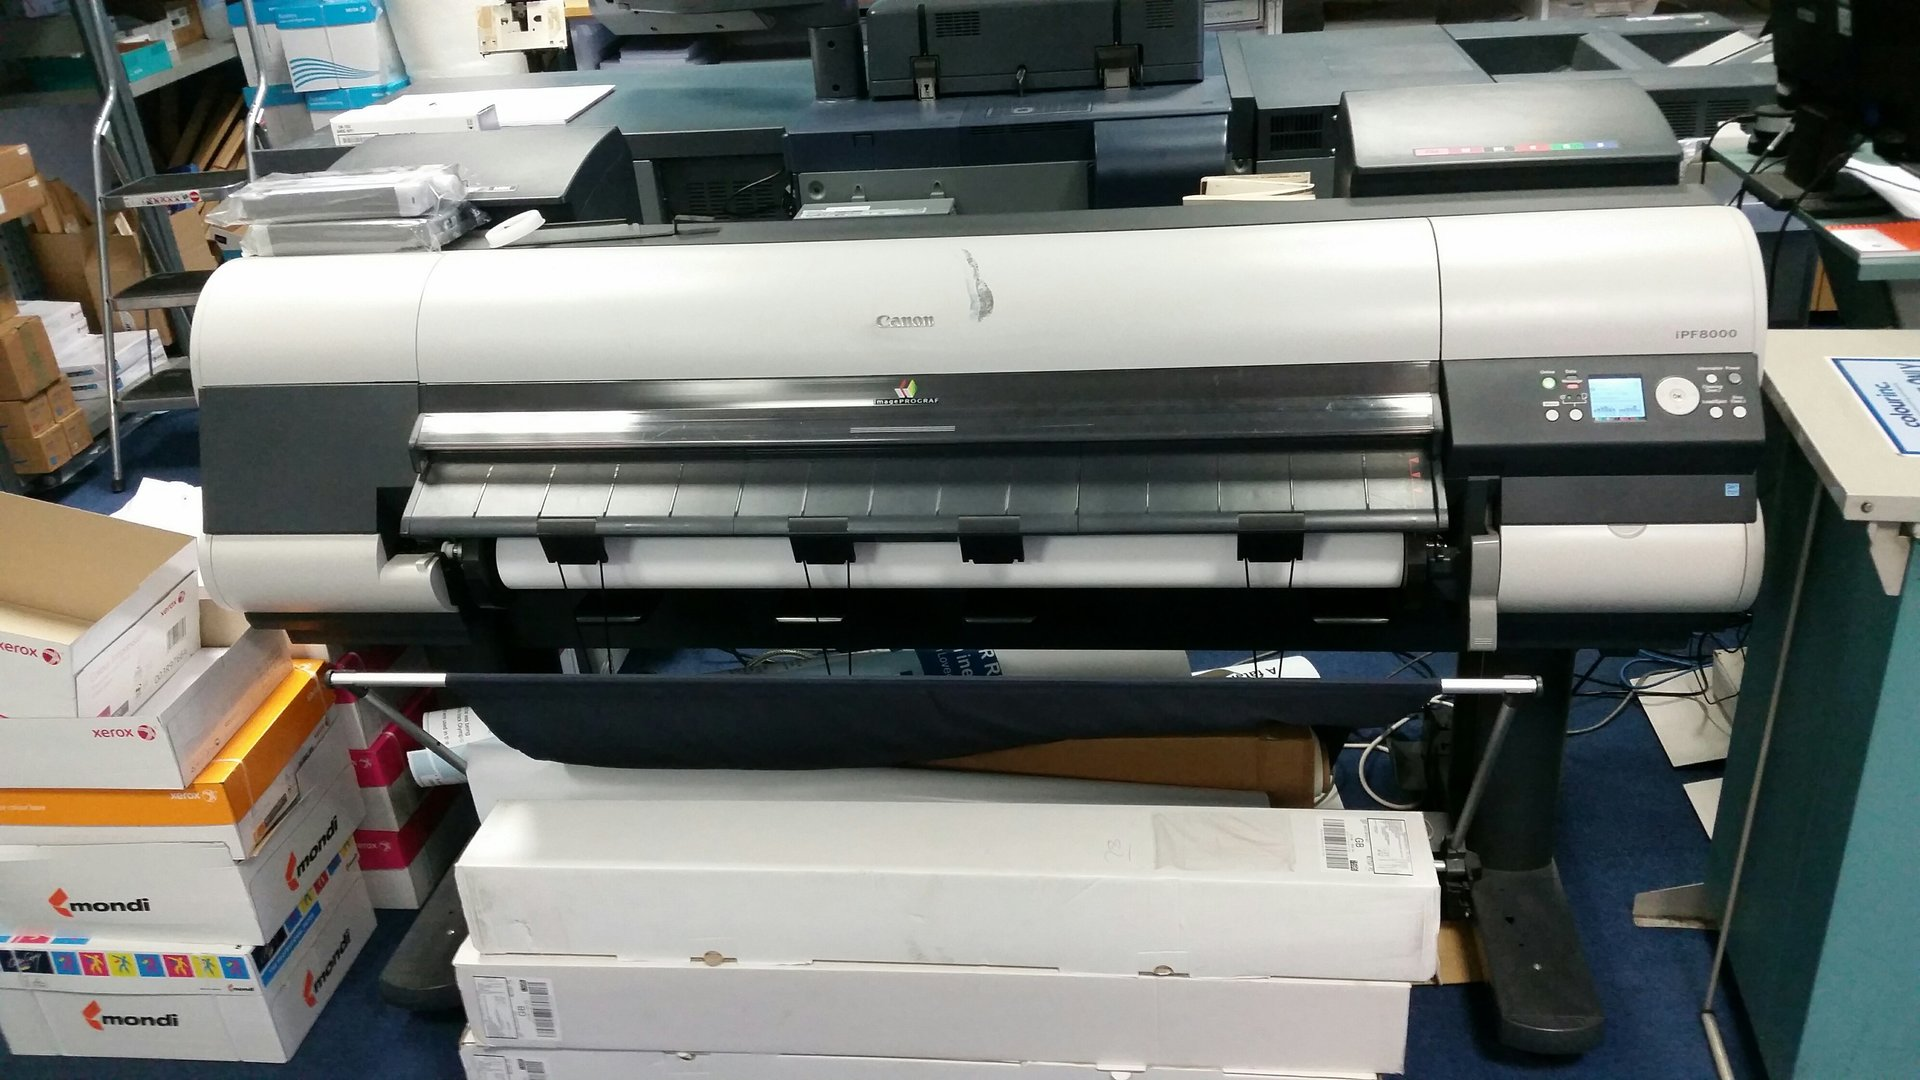 Canon large format printer